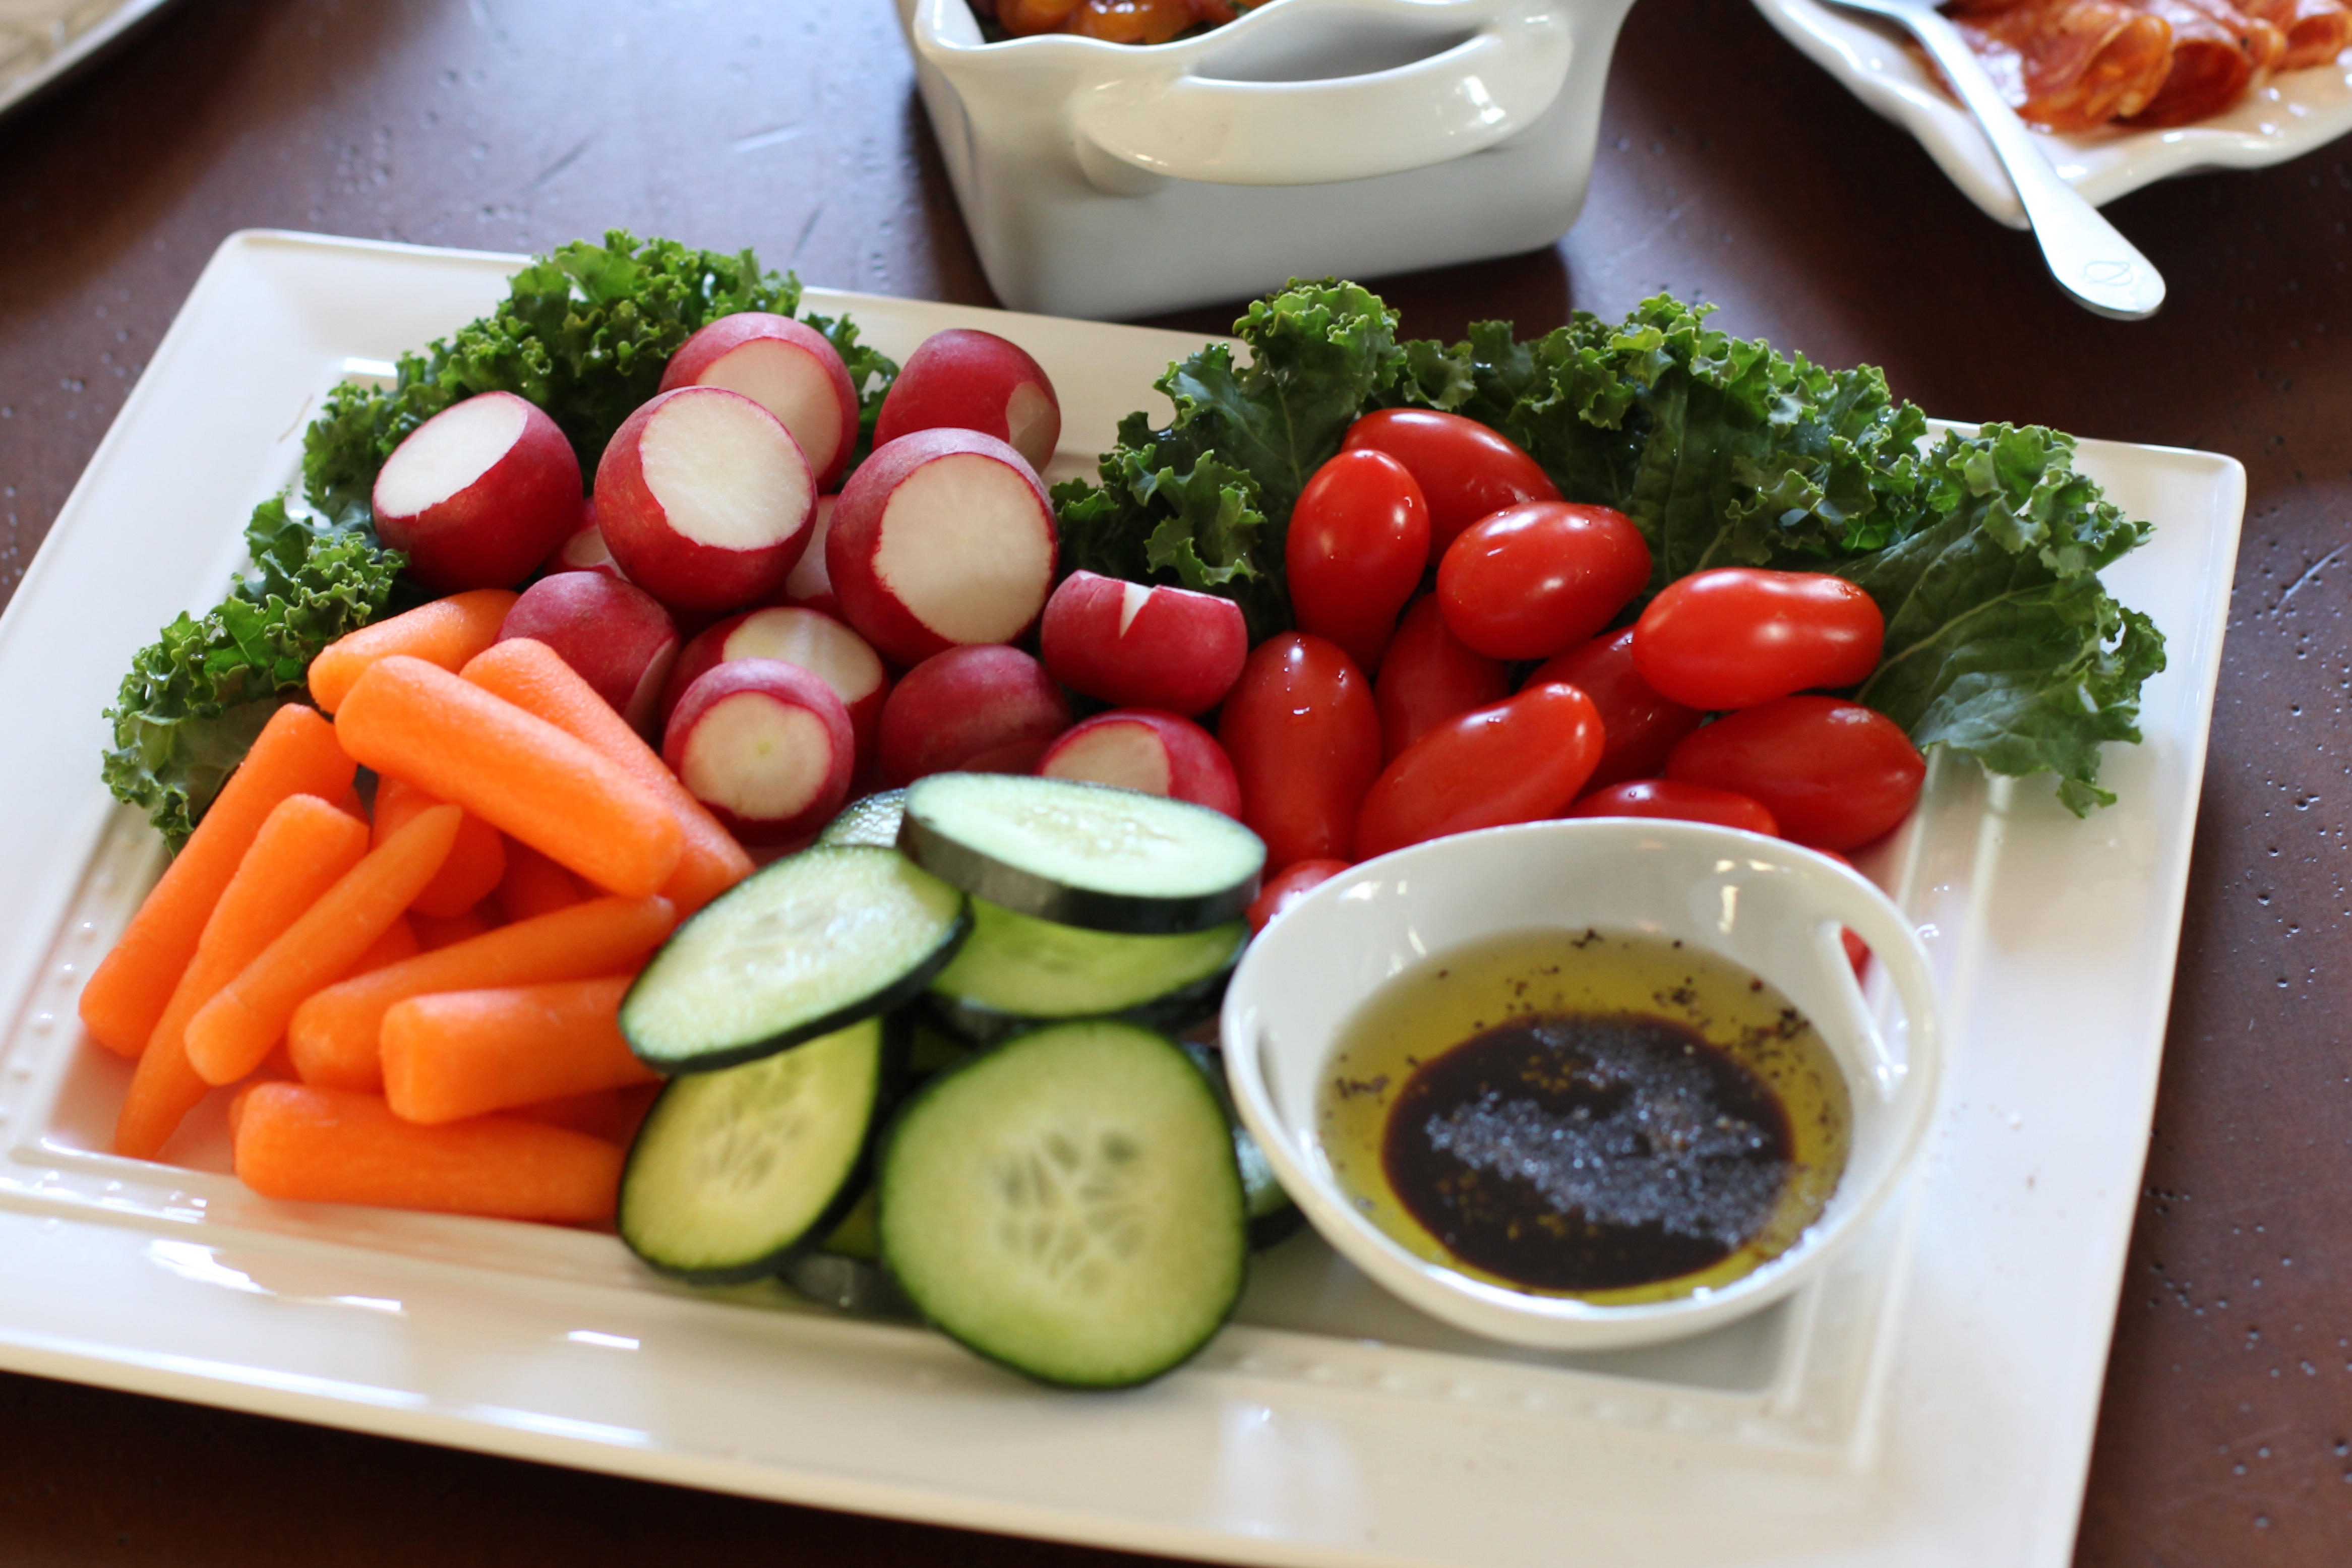 how to cut rockmelon for a platter